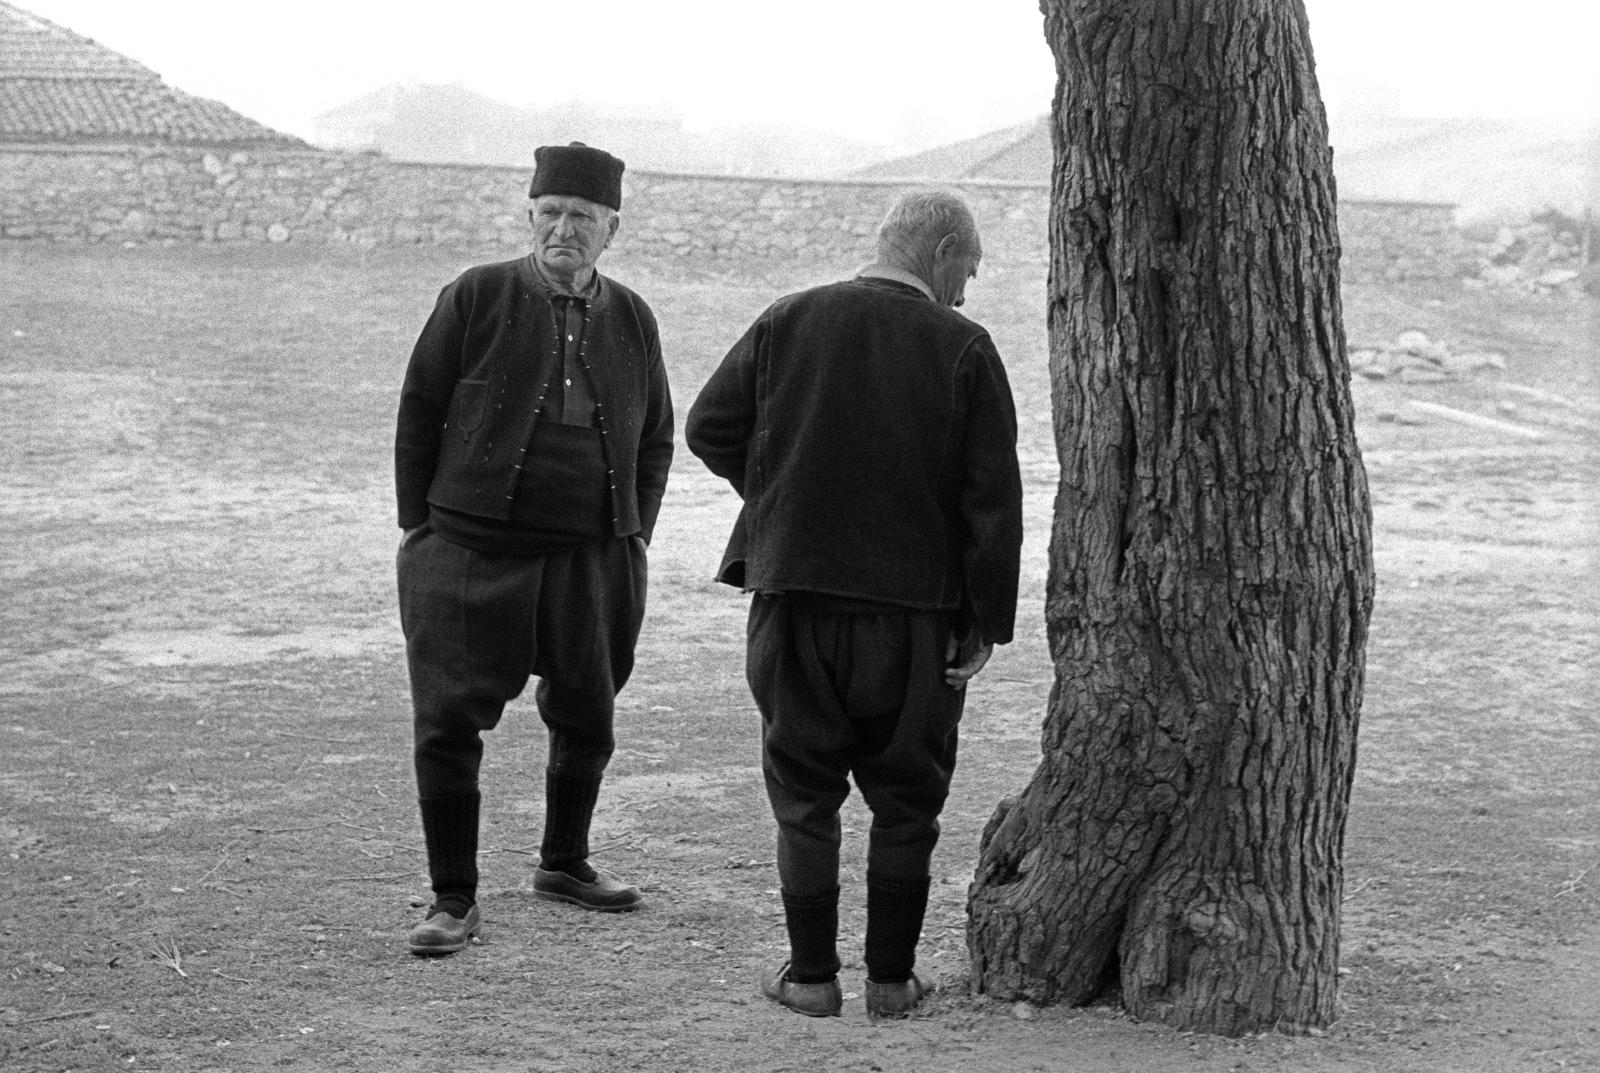 <p><strong>България -</strong> <strong>Двама мъже</strong>, село Йерусалимово, Тракия, България, 1979<br /> Автор: Мартин Кейнинг</p>